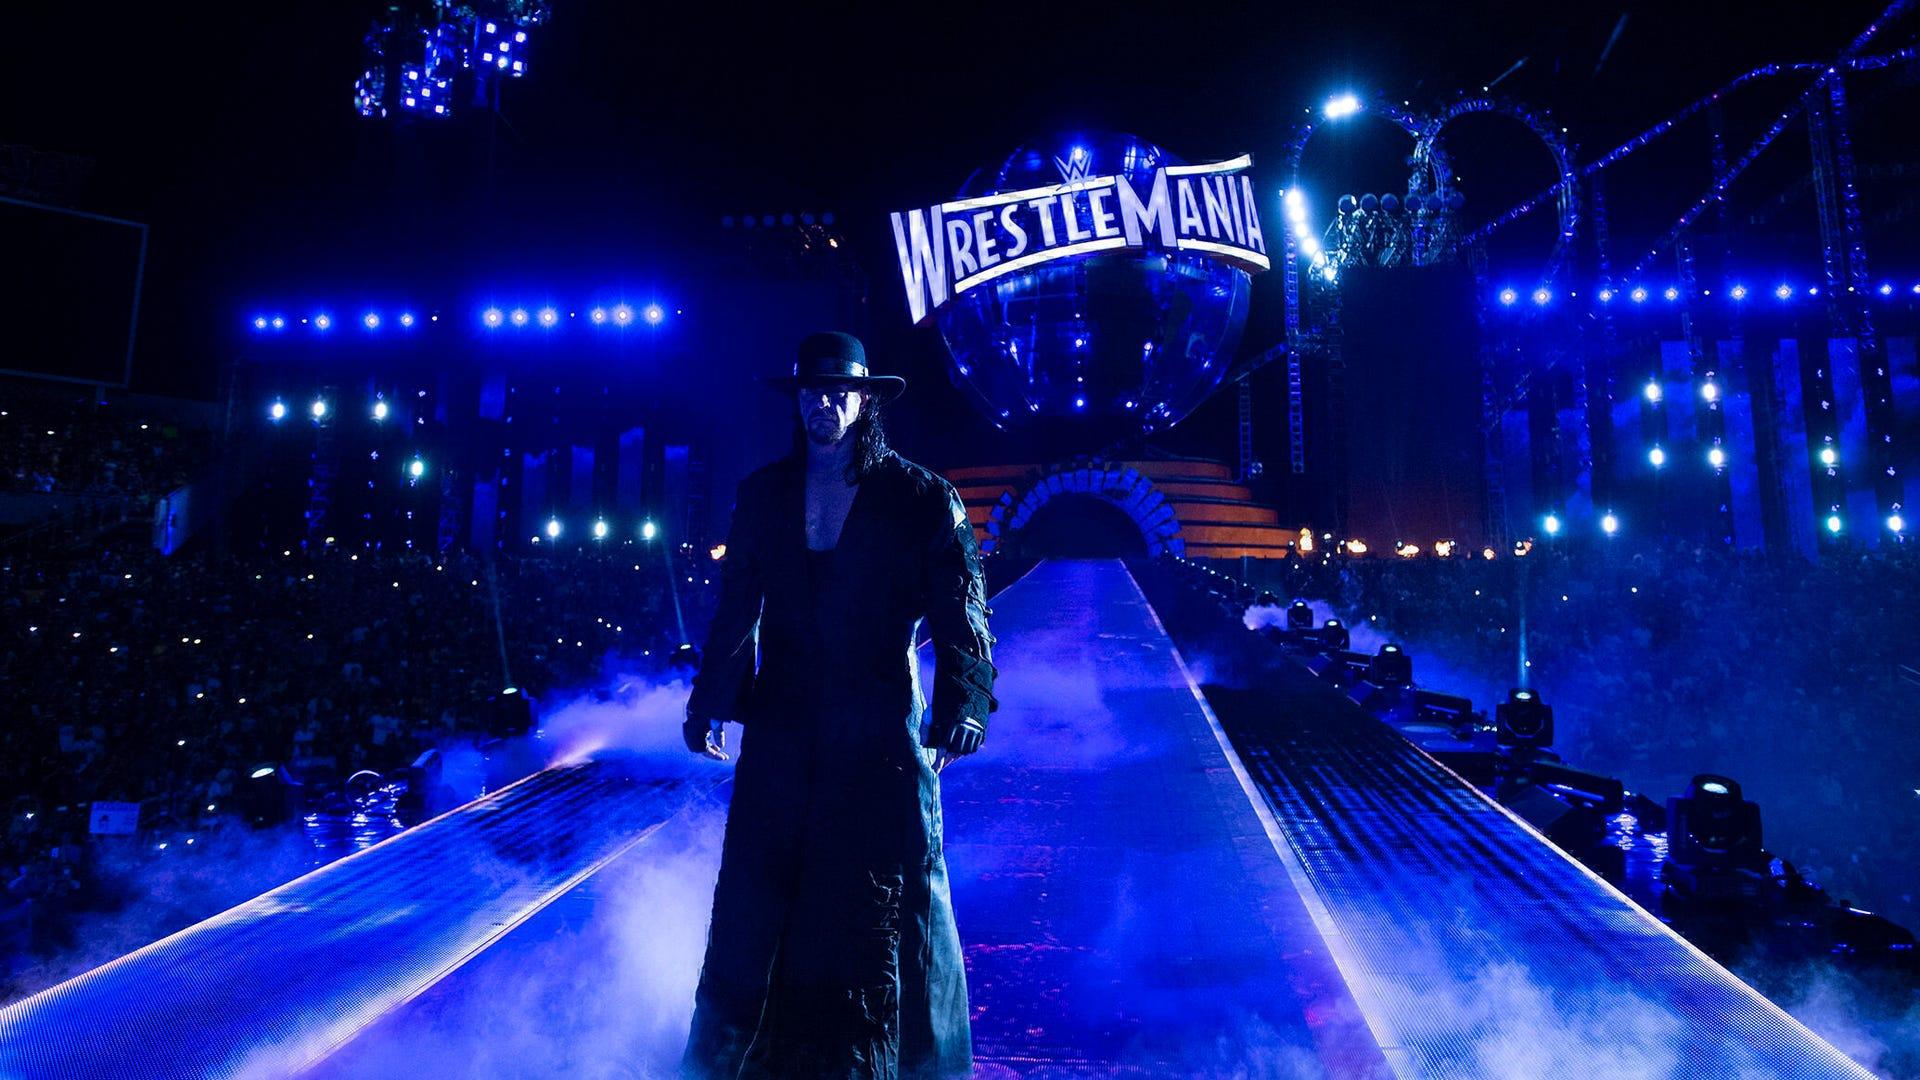 The Undertaker, WrestleMania 33